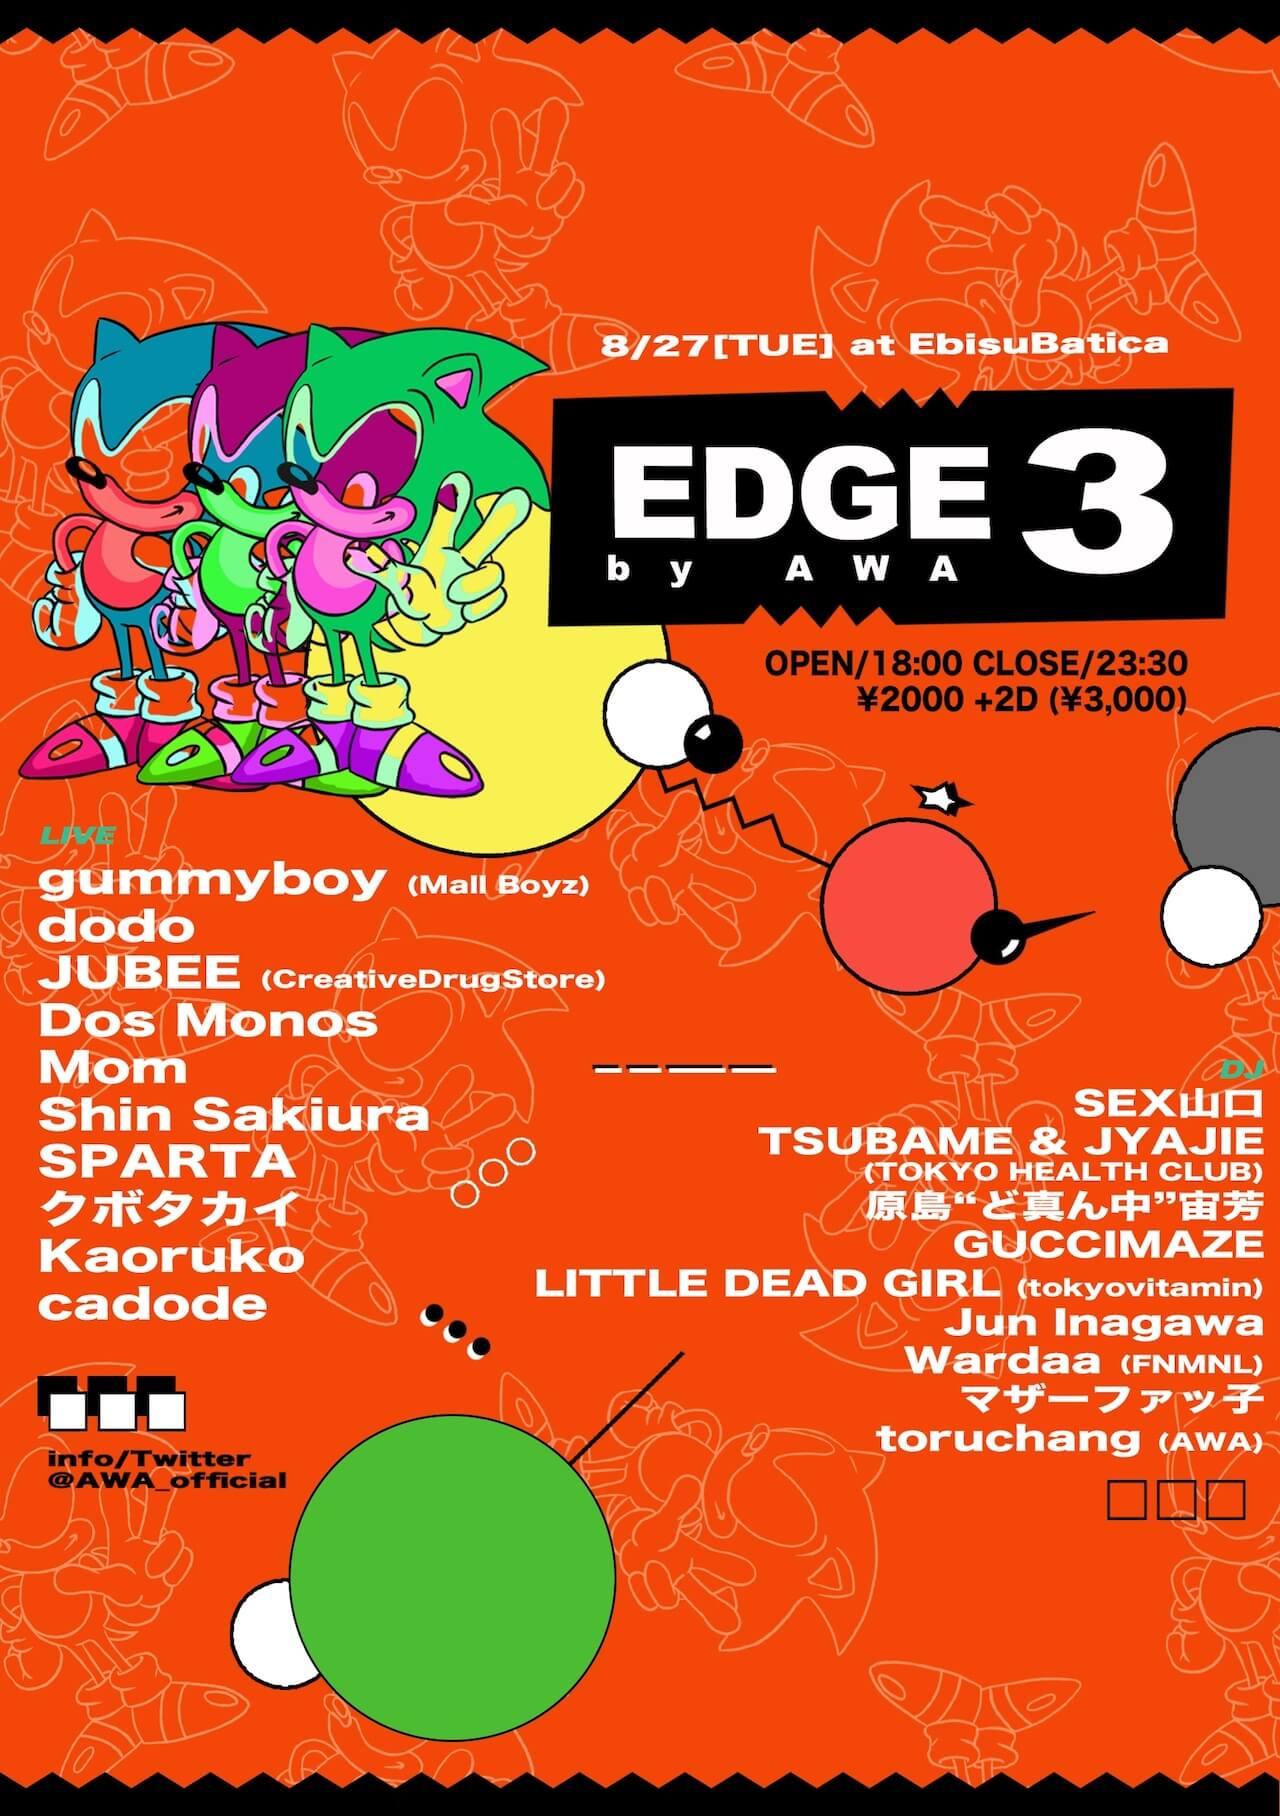 AWAによるイベント『EDGE』の第3回が開催|dodo、JUBEE、Dos Monos、Mom、Shin Sakiura、SPARTA、クボタカイ、gummyboyらが出演 awa-edge-190813